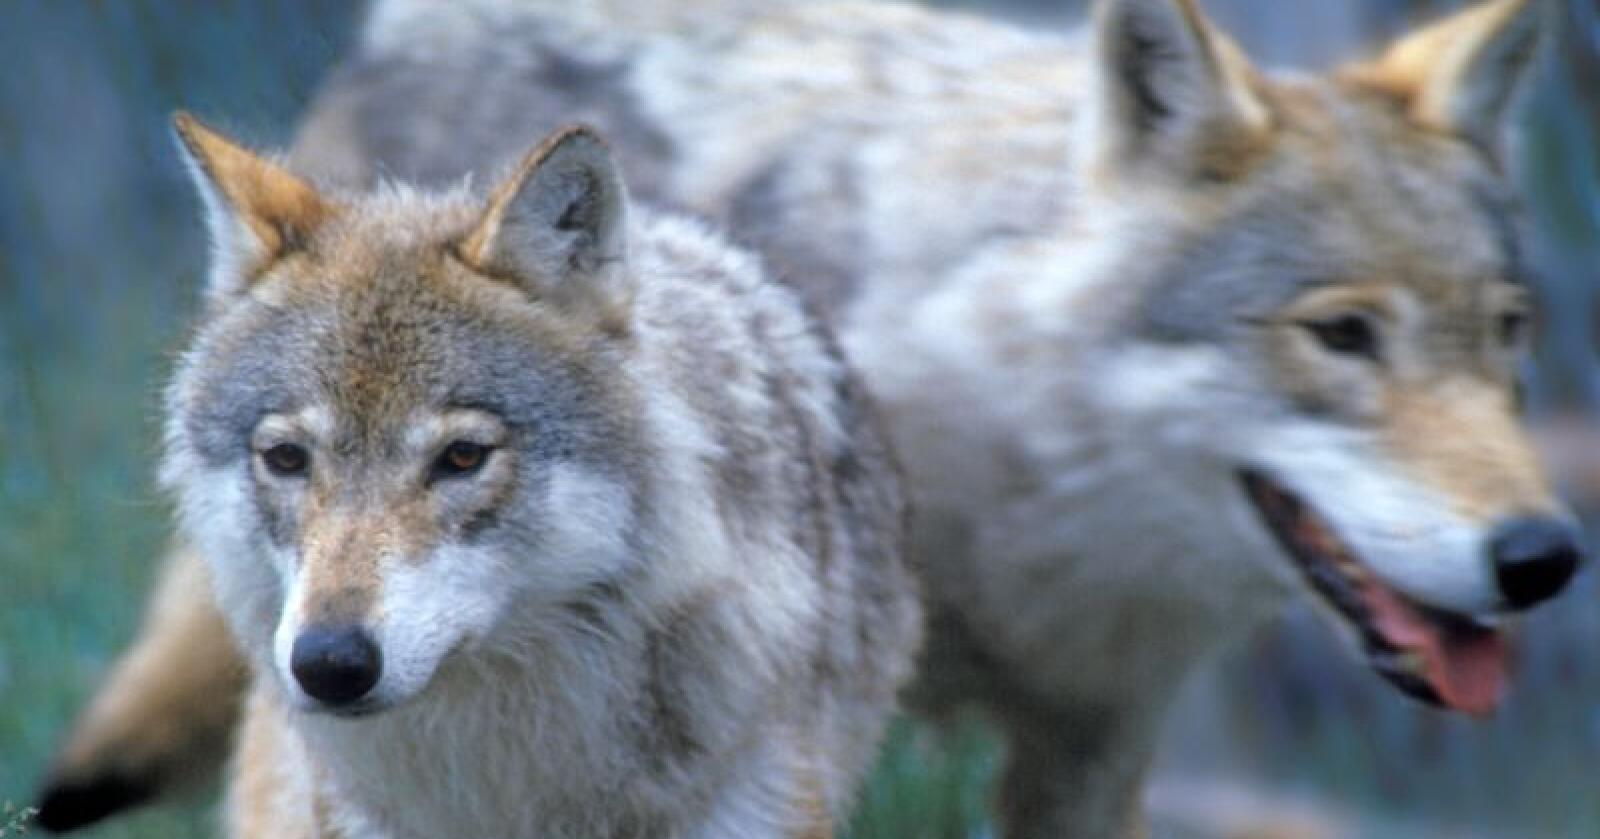 Opphavet til norske ulver skal dokumenteres. Foto Per Løchen / NTB scanpix